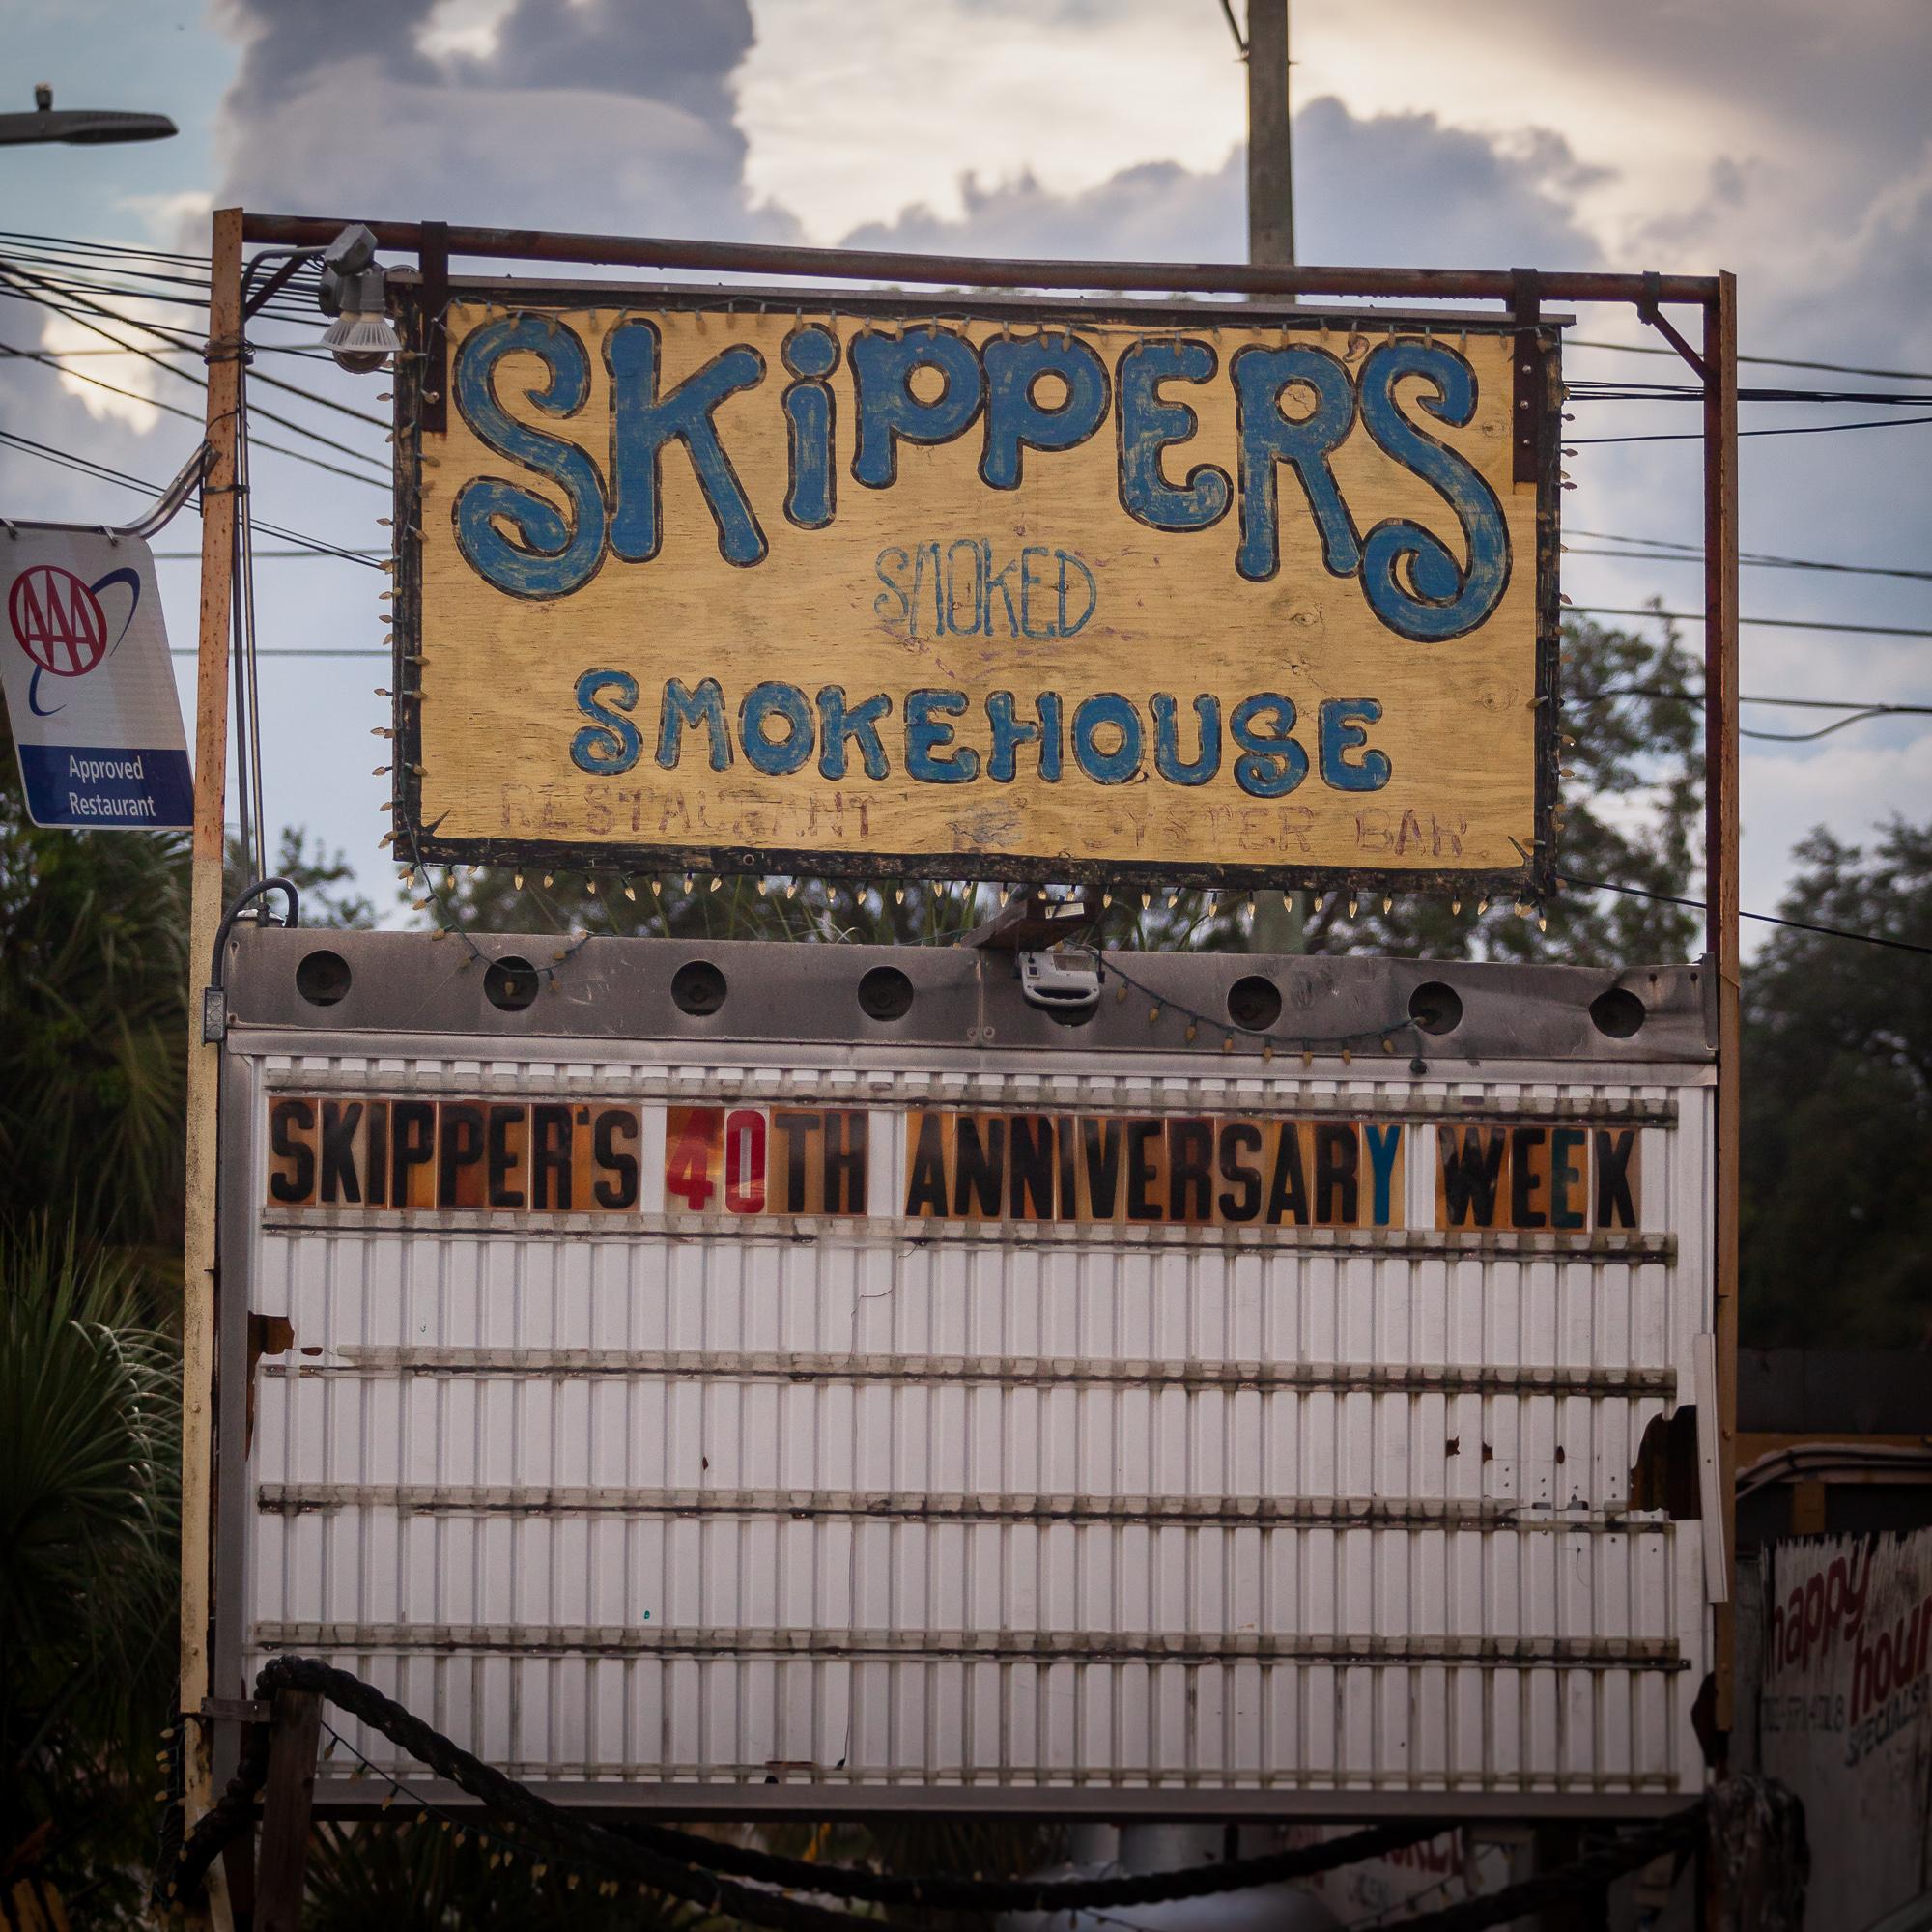 Skippers Smoke House Marquee | David Rañon